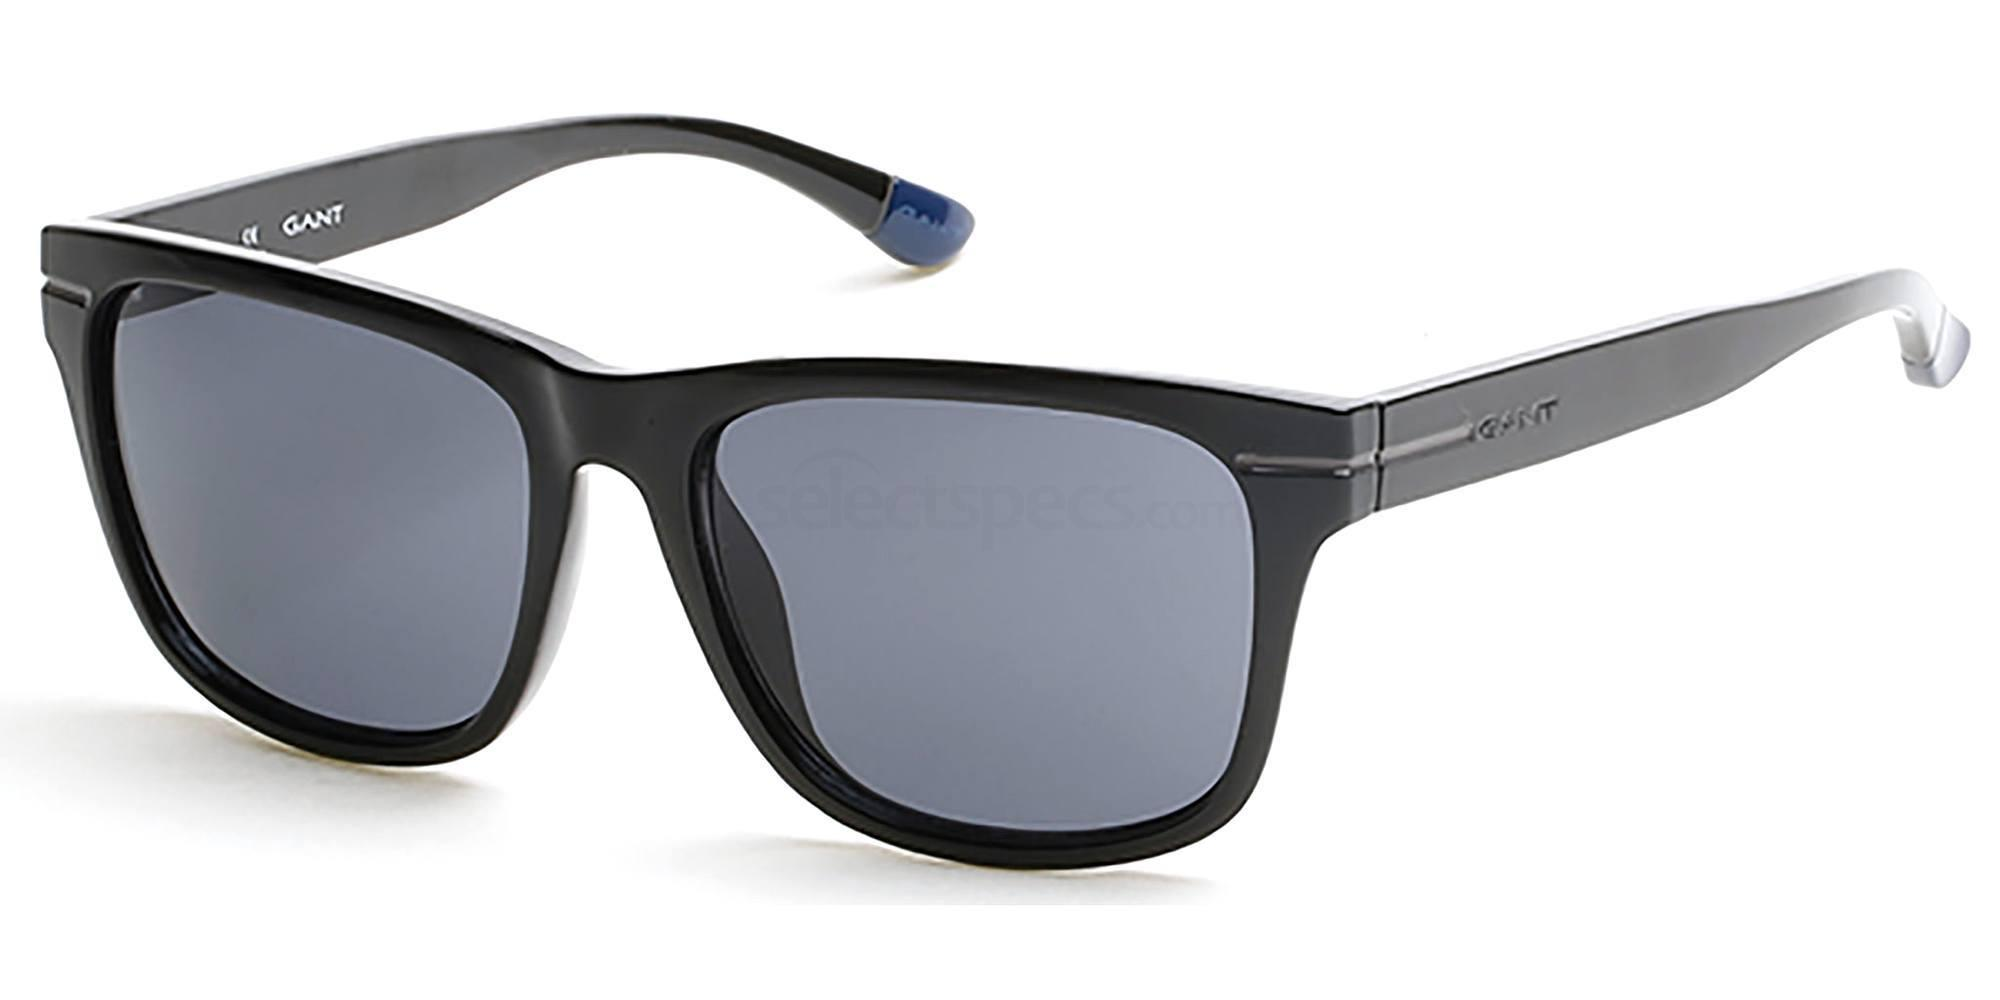 01A GA7058 Sunglasses, Gant